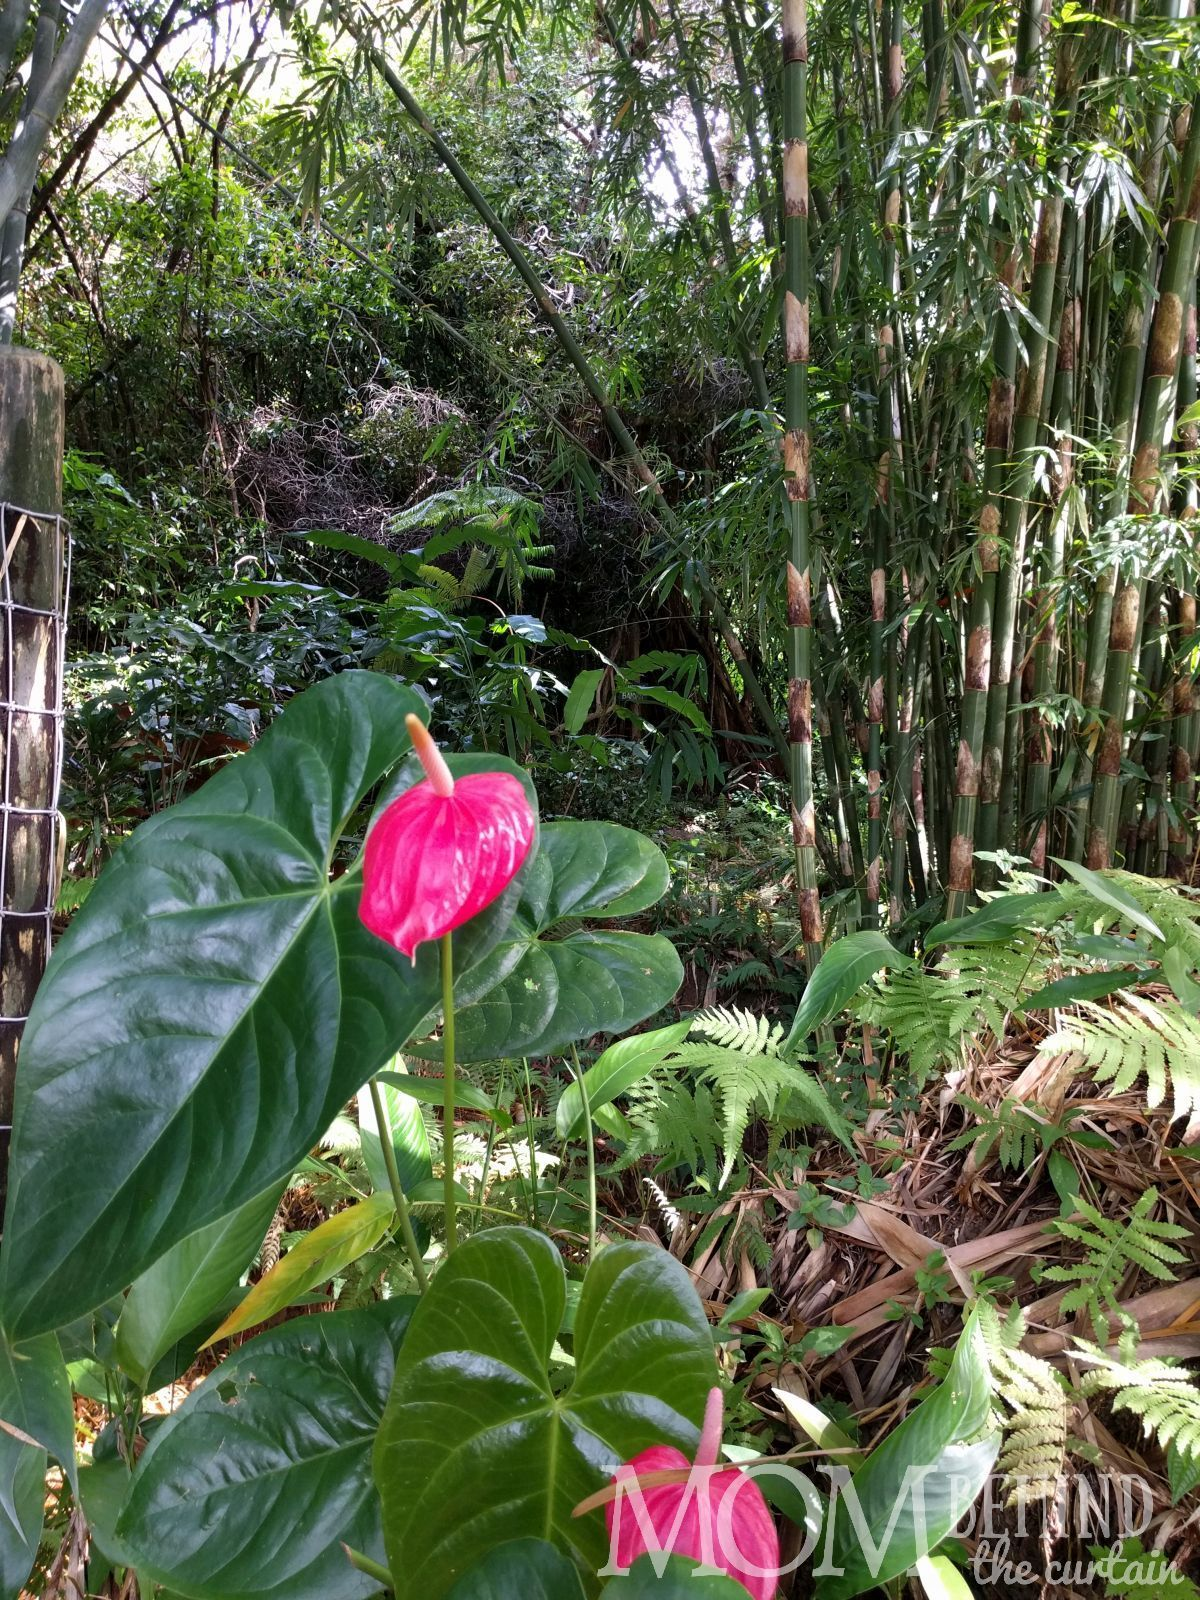 389bde056b2fcb3447372c9dbc3f369e - Hana Maui Botanical Gardens Hana Hi